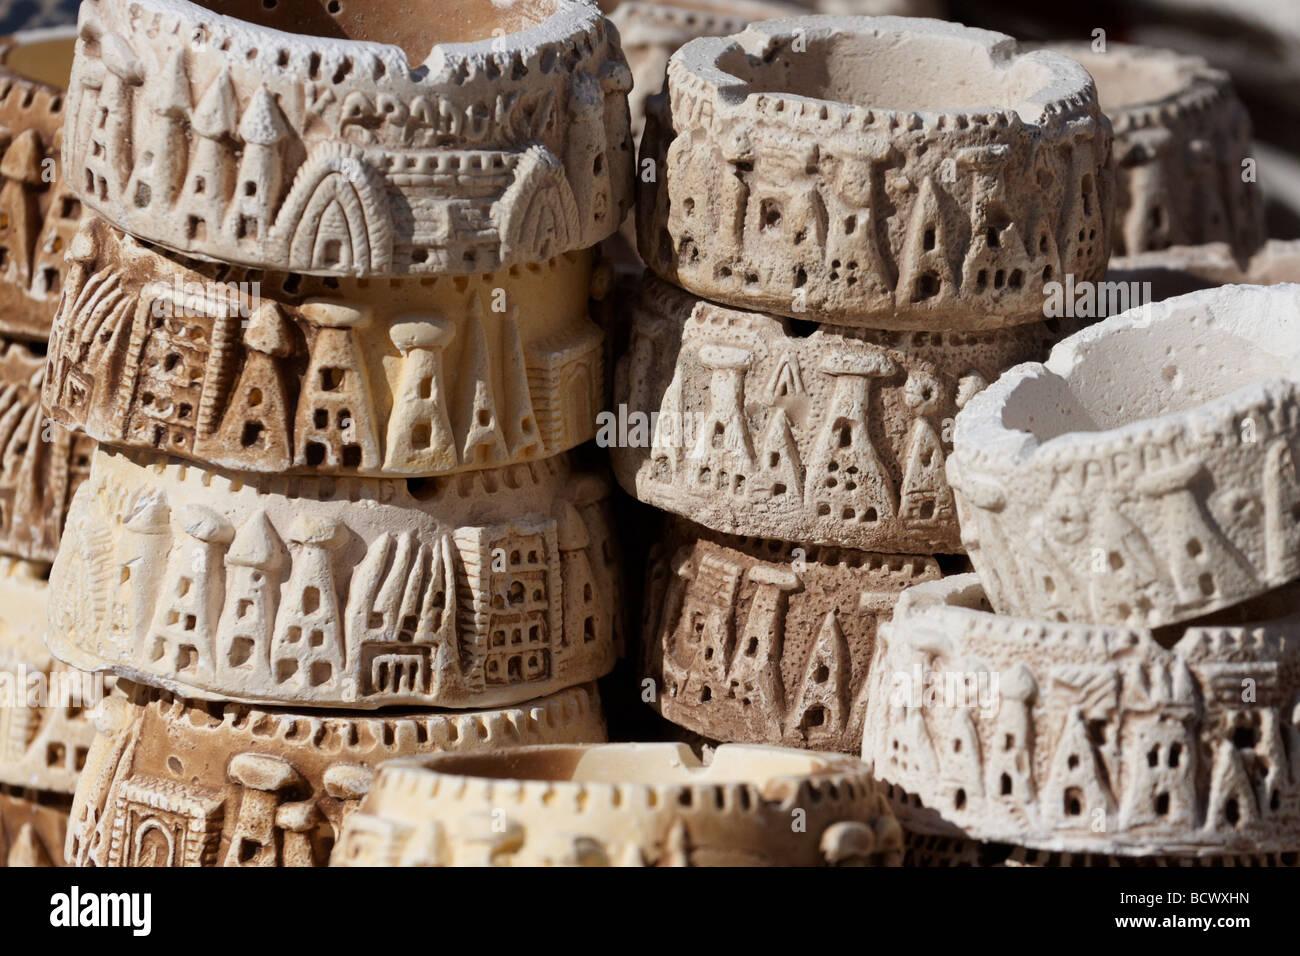 Souvenirs for sale Goreme Turkey Anatolia - Stock Image